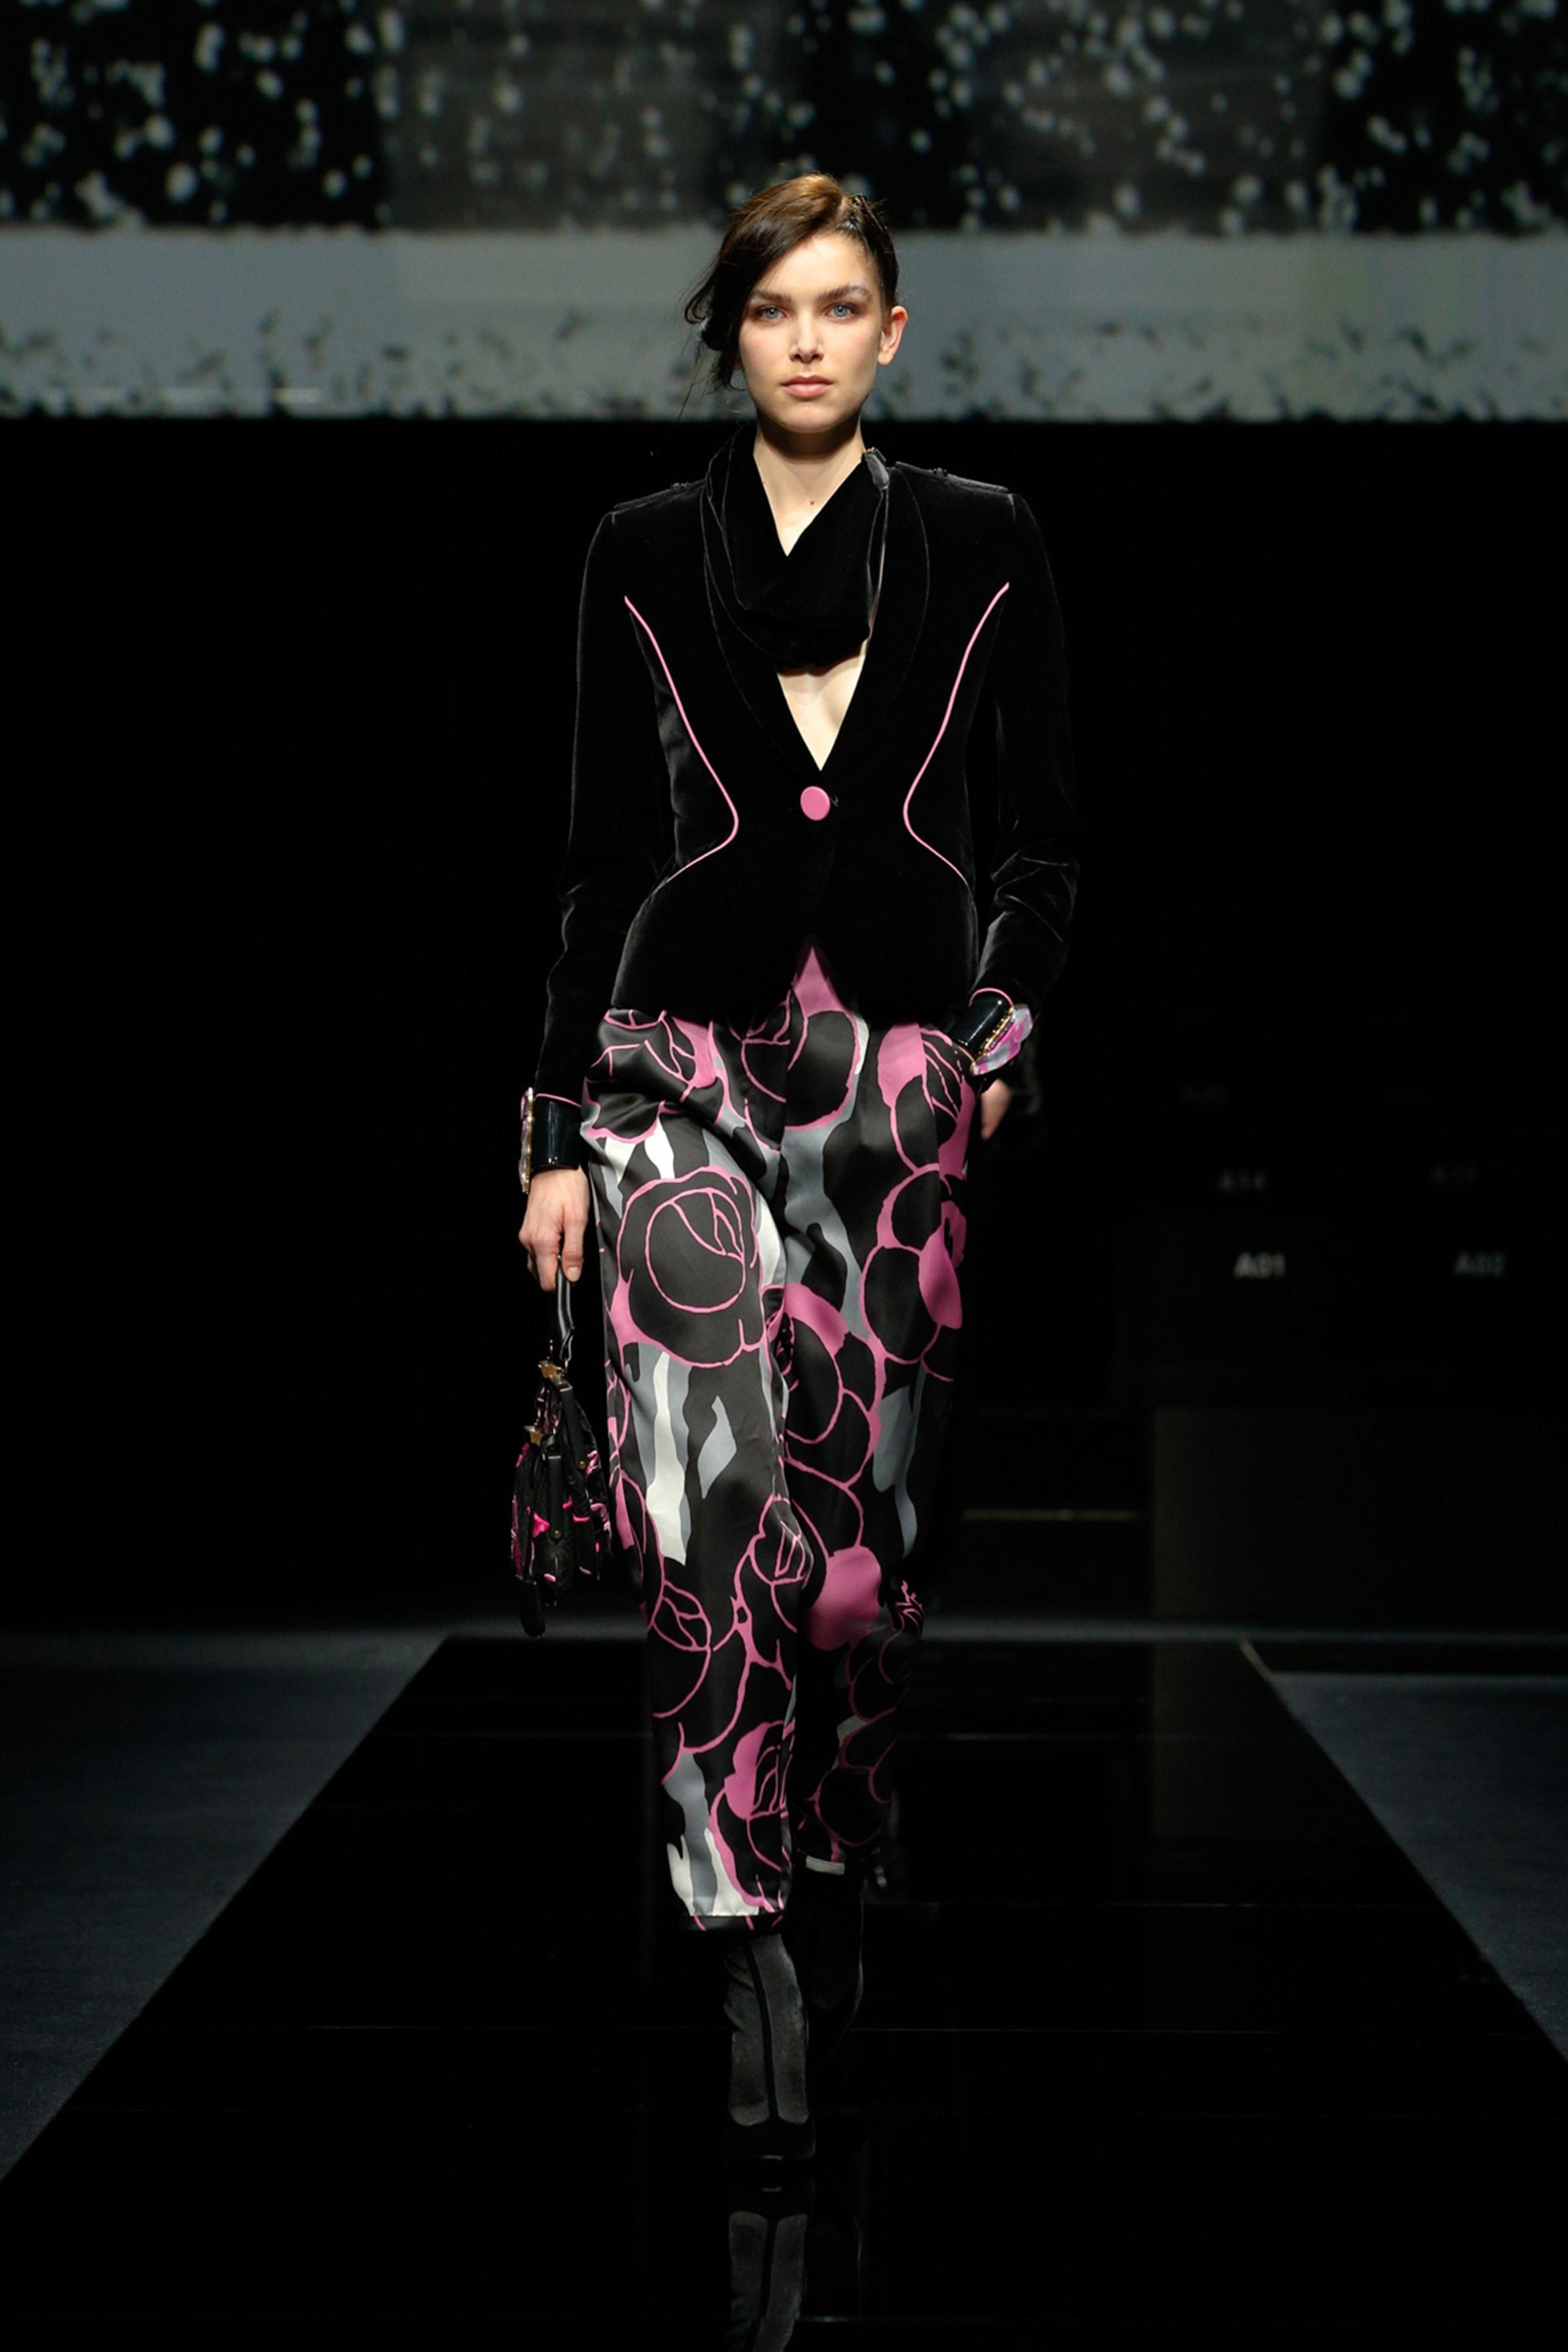 Khong co khach moi den Milan Fashion Week vi lo ngai virus corona hinh anh 2 g2.jpg